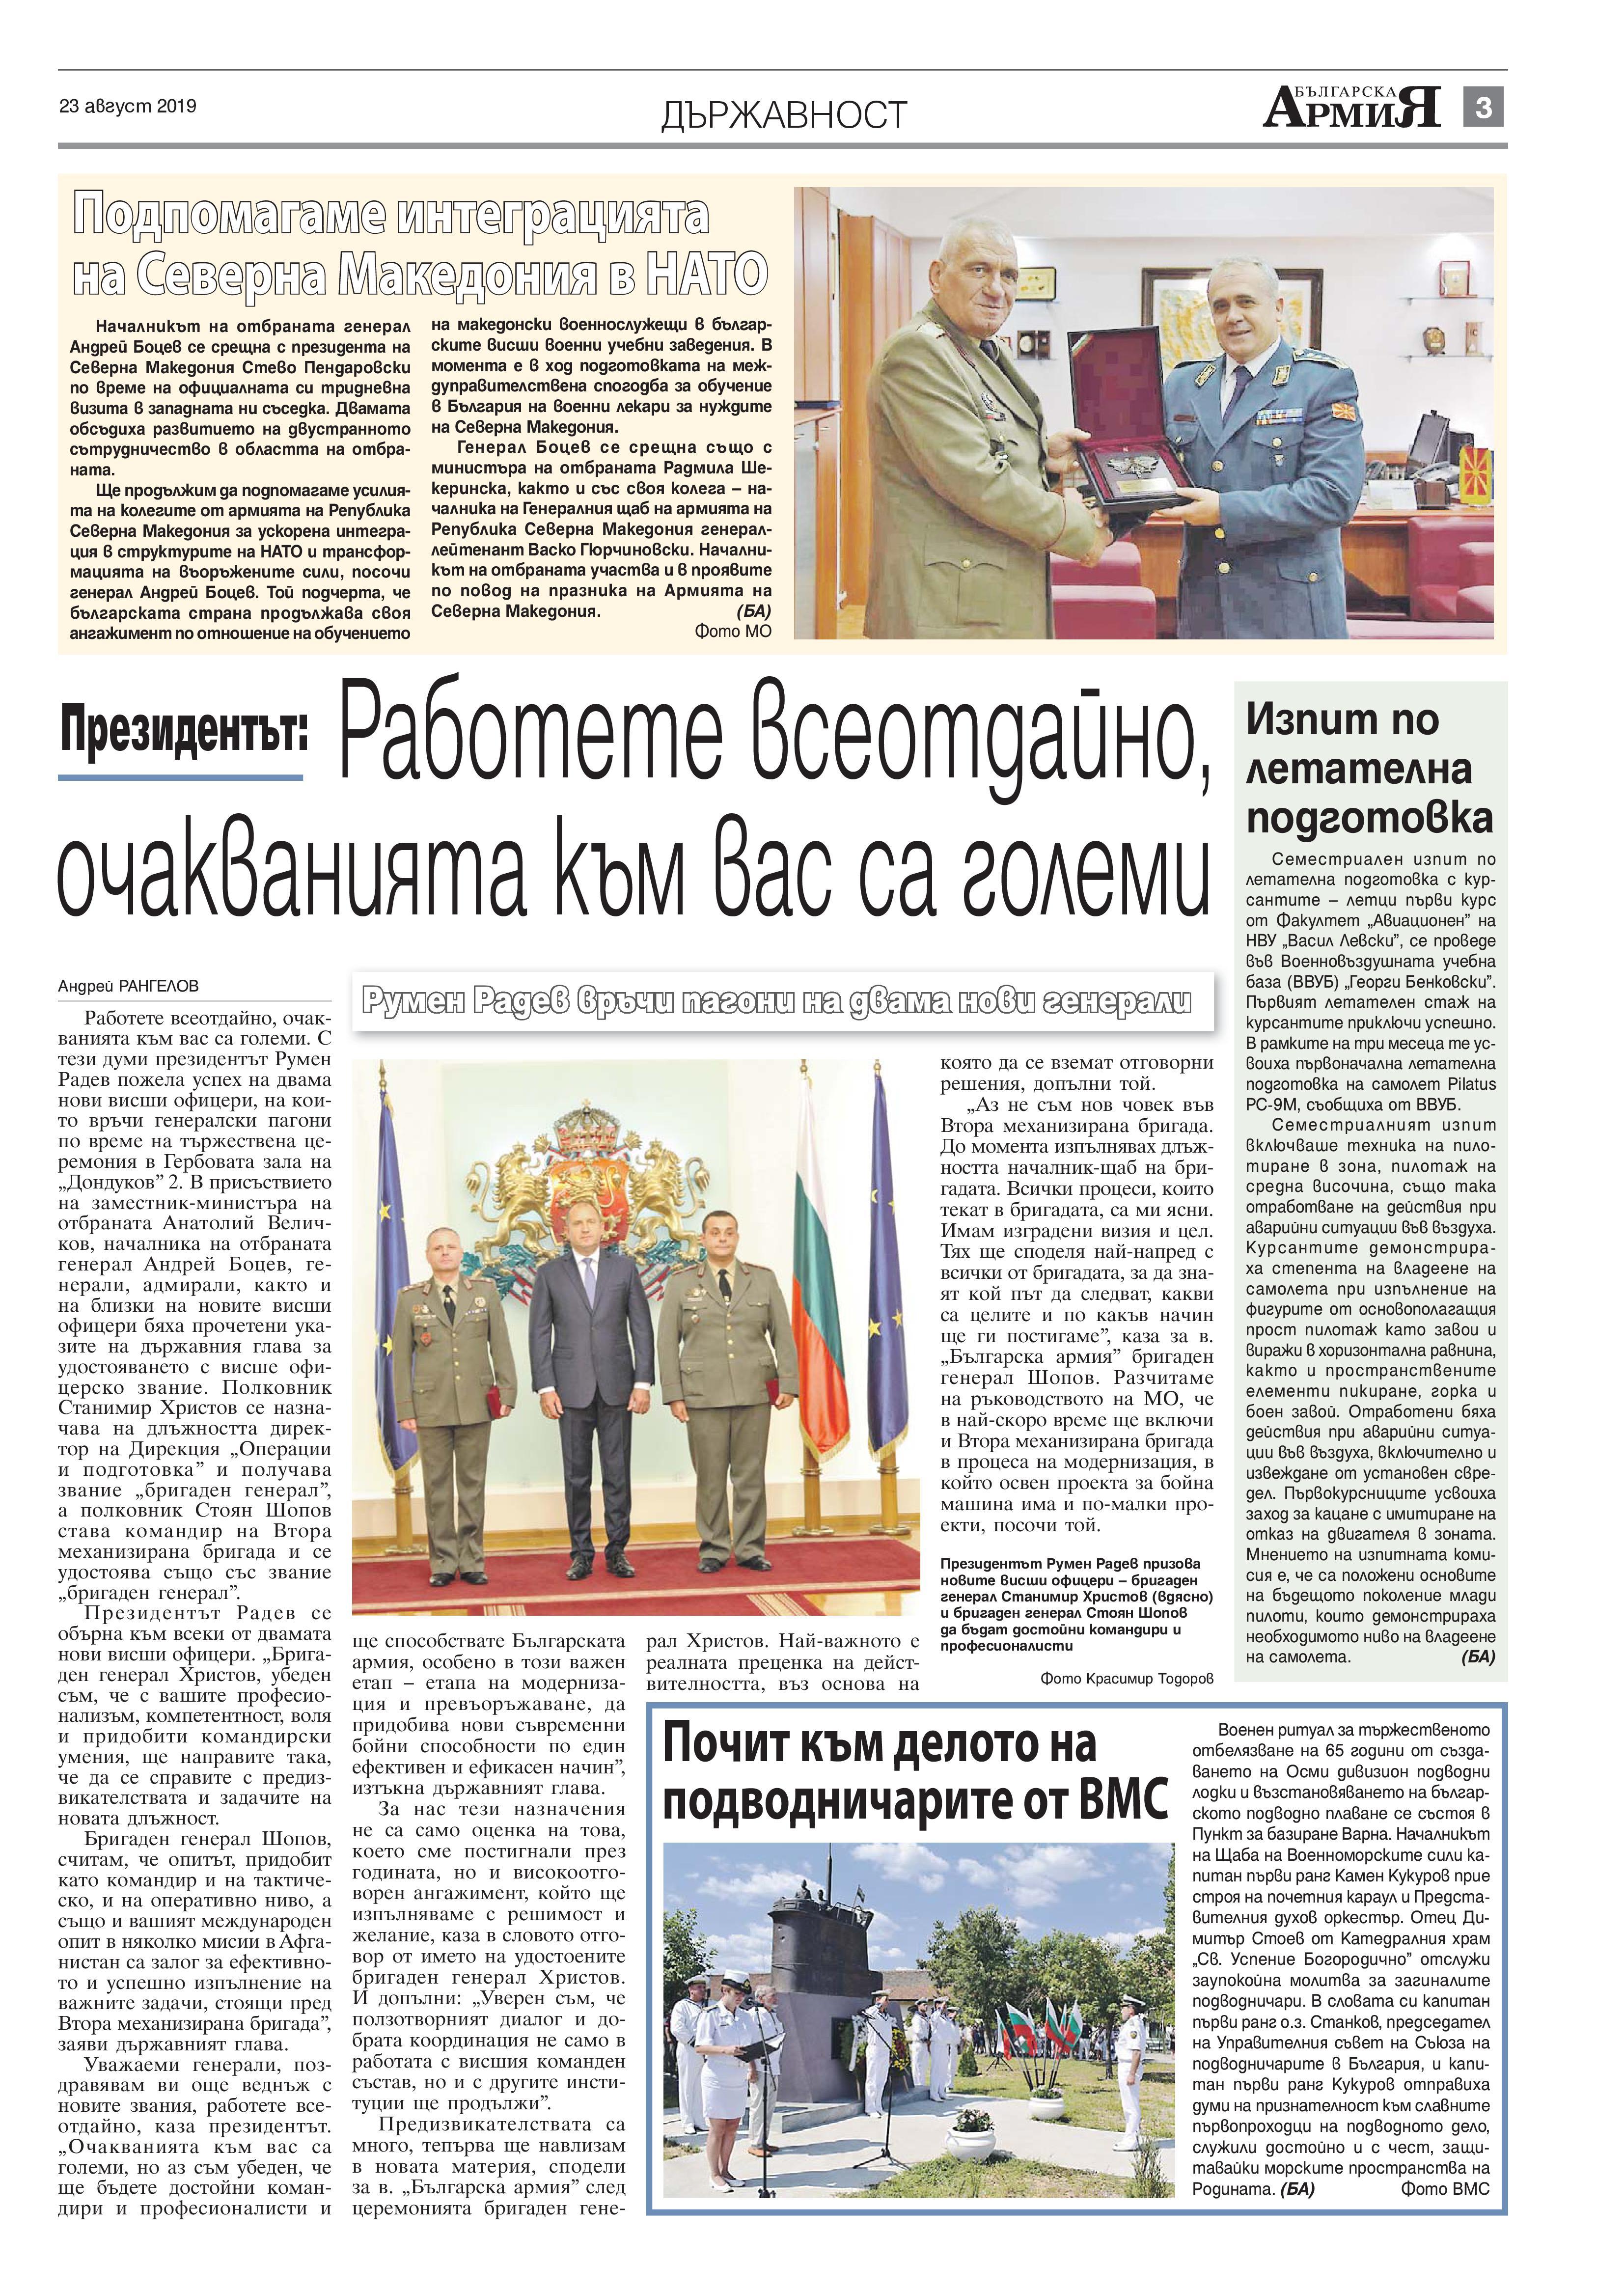 https://www.armymedia.bg/wp-content/uploads/2015/06/03-29.jpg